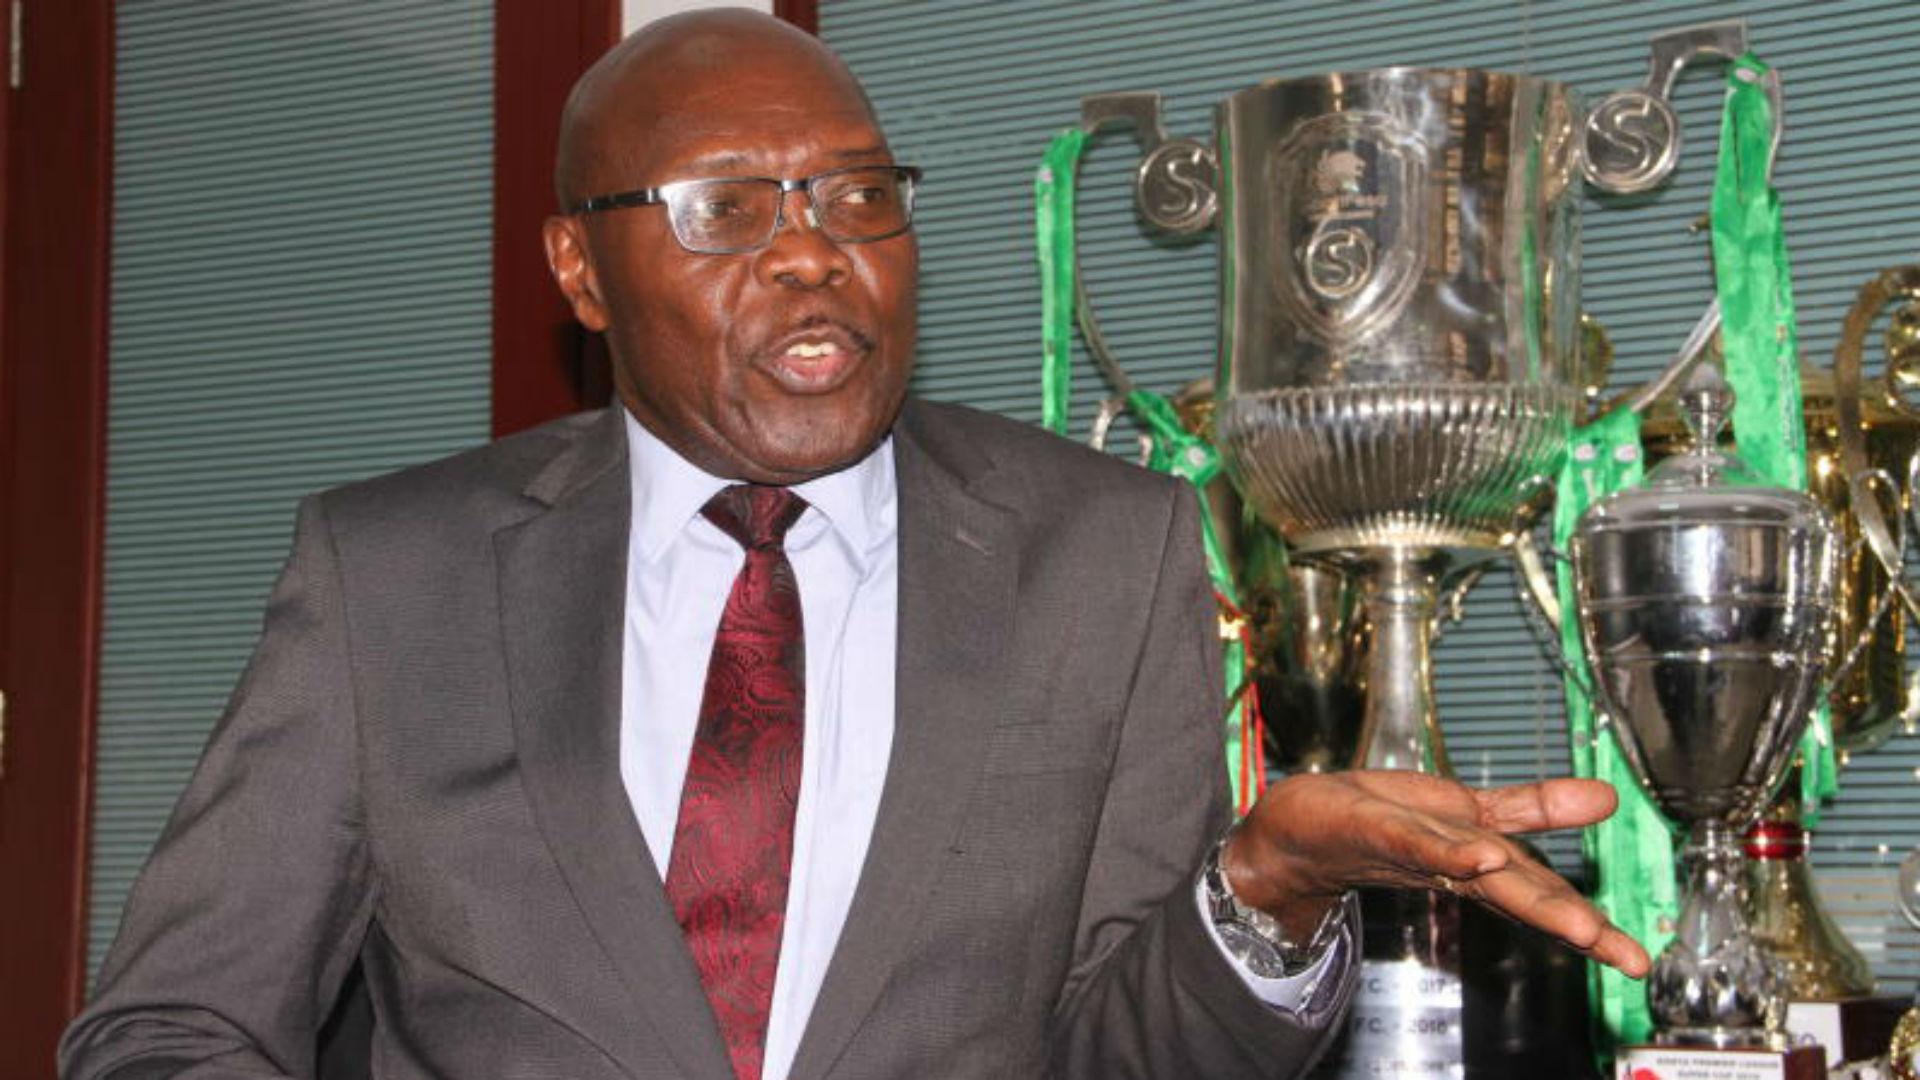 'Mwendwa's FKF leadership the worst Kenya has had' - Gor Mahia's Rachier